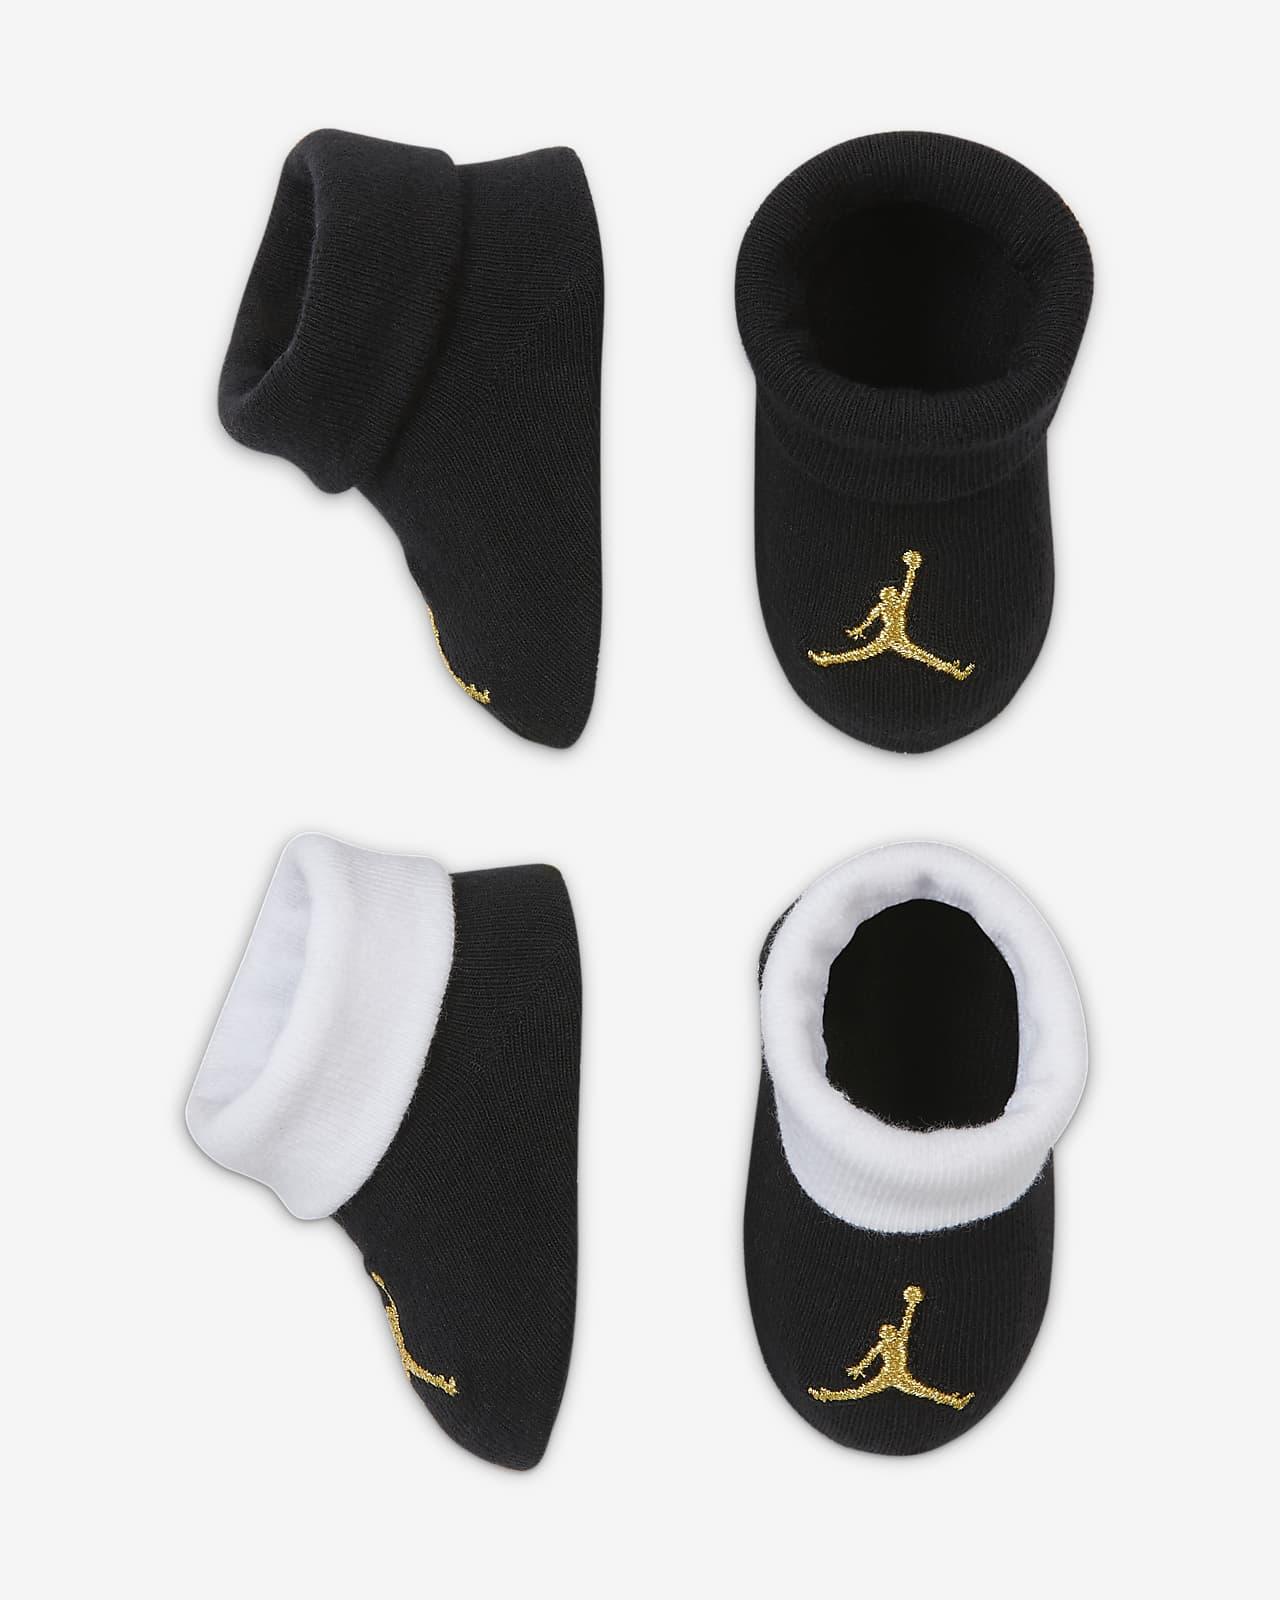 Jordan Baby Booties (2 Pairs)